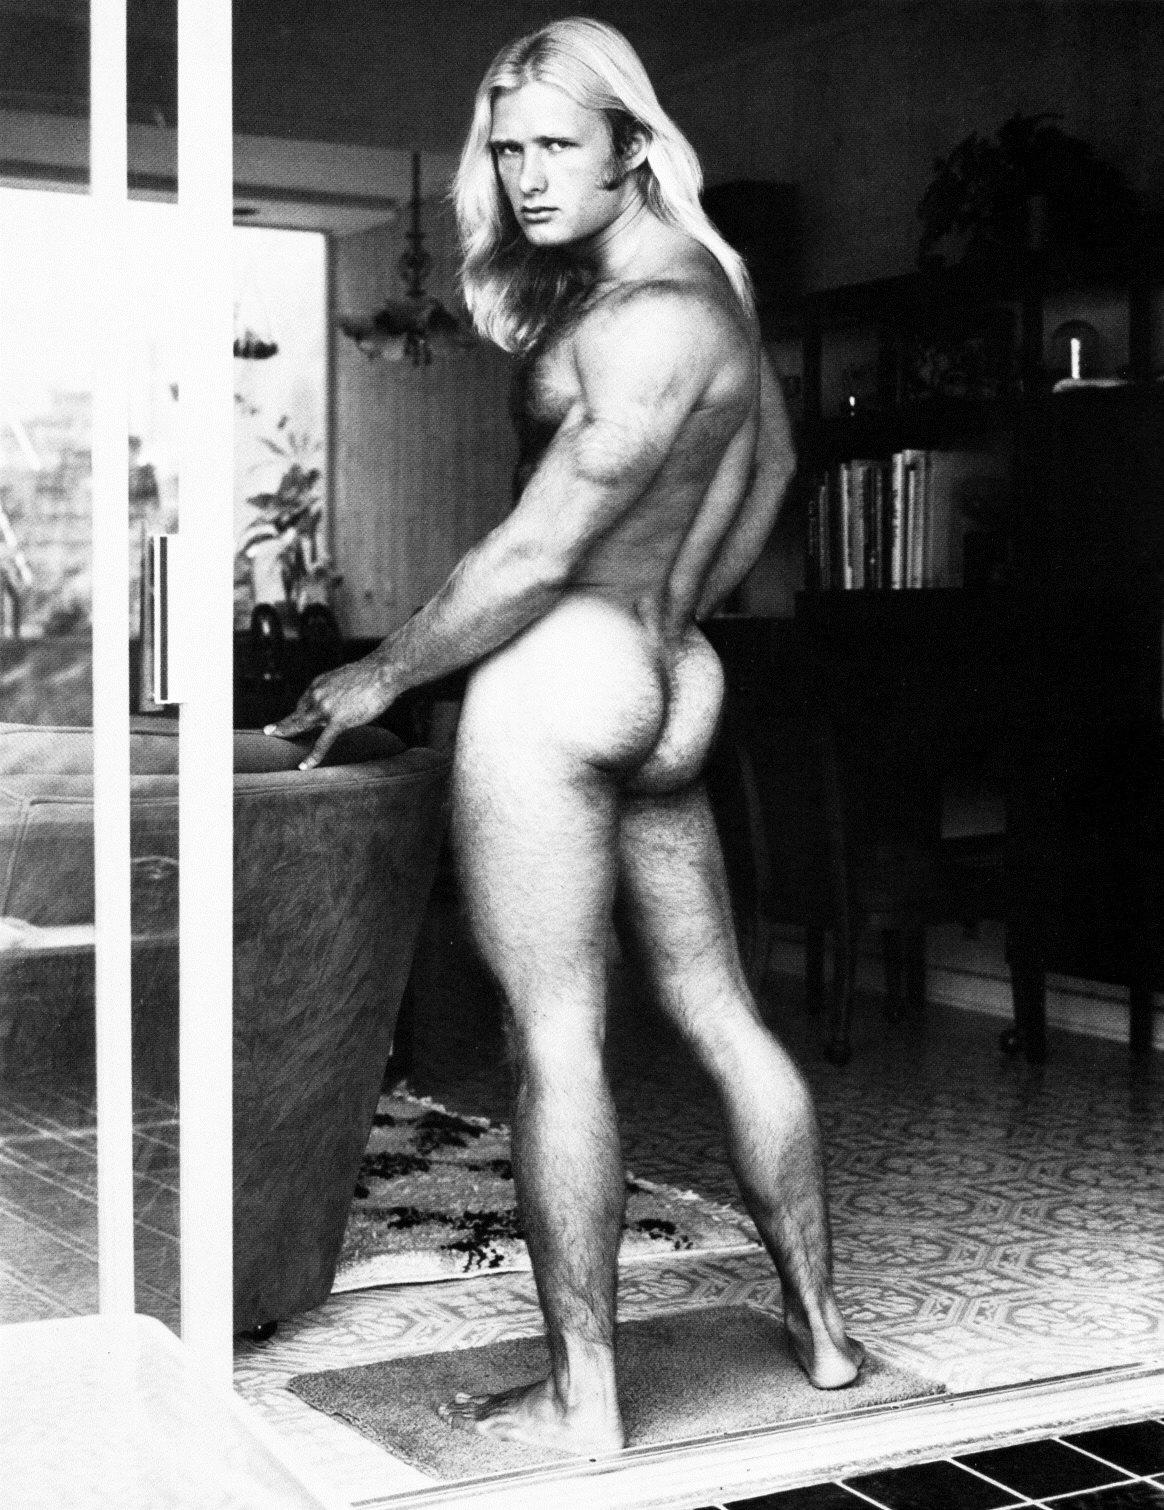 hairy porn raw retro Classic Vintage Retro Porn Photo Galleries: Free Vintage Gallery.